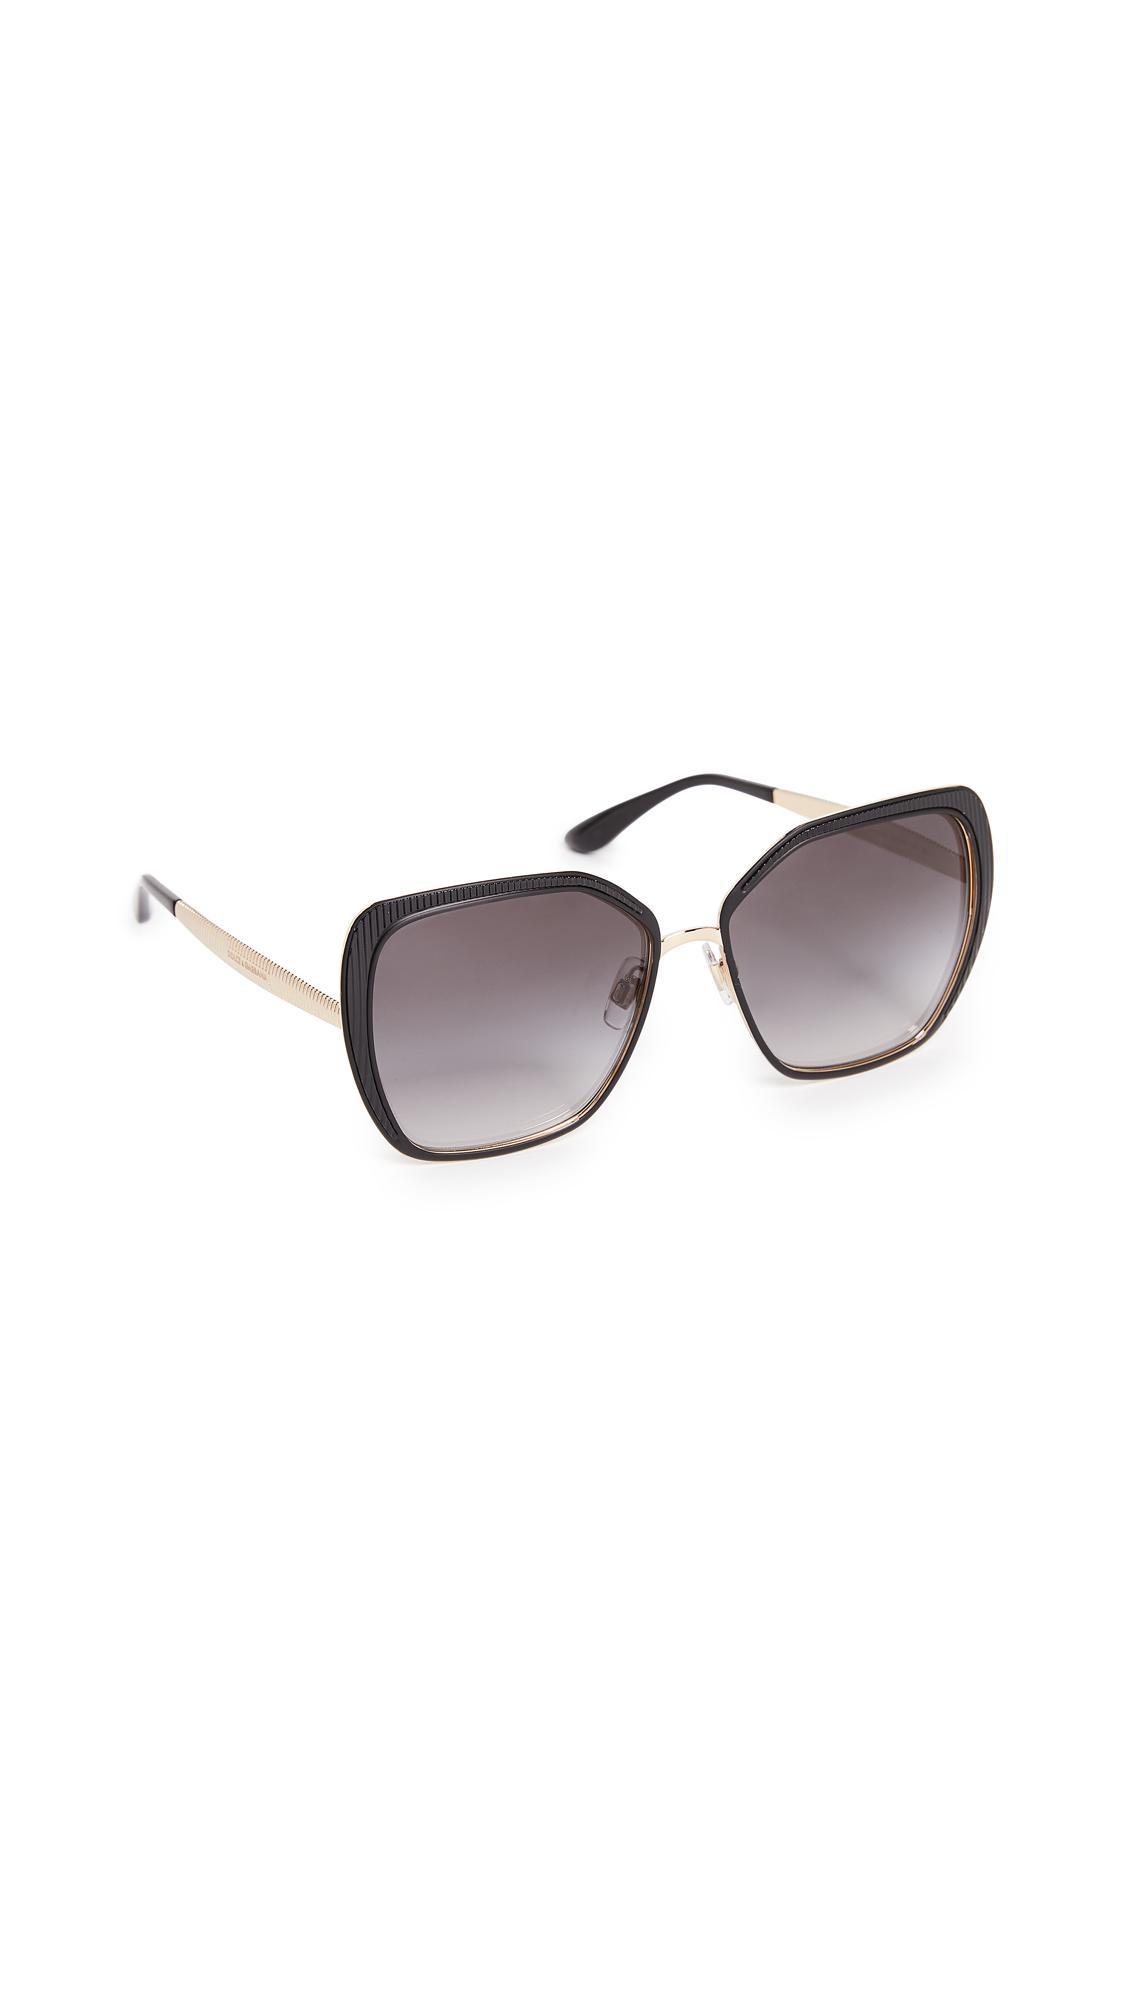 Dolce & Gabbana Square Fluted Sunglasses In Matte Black/grey